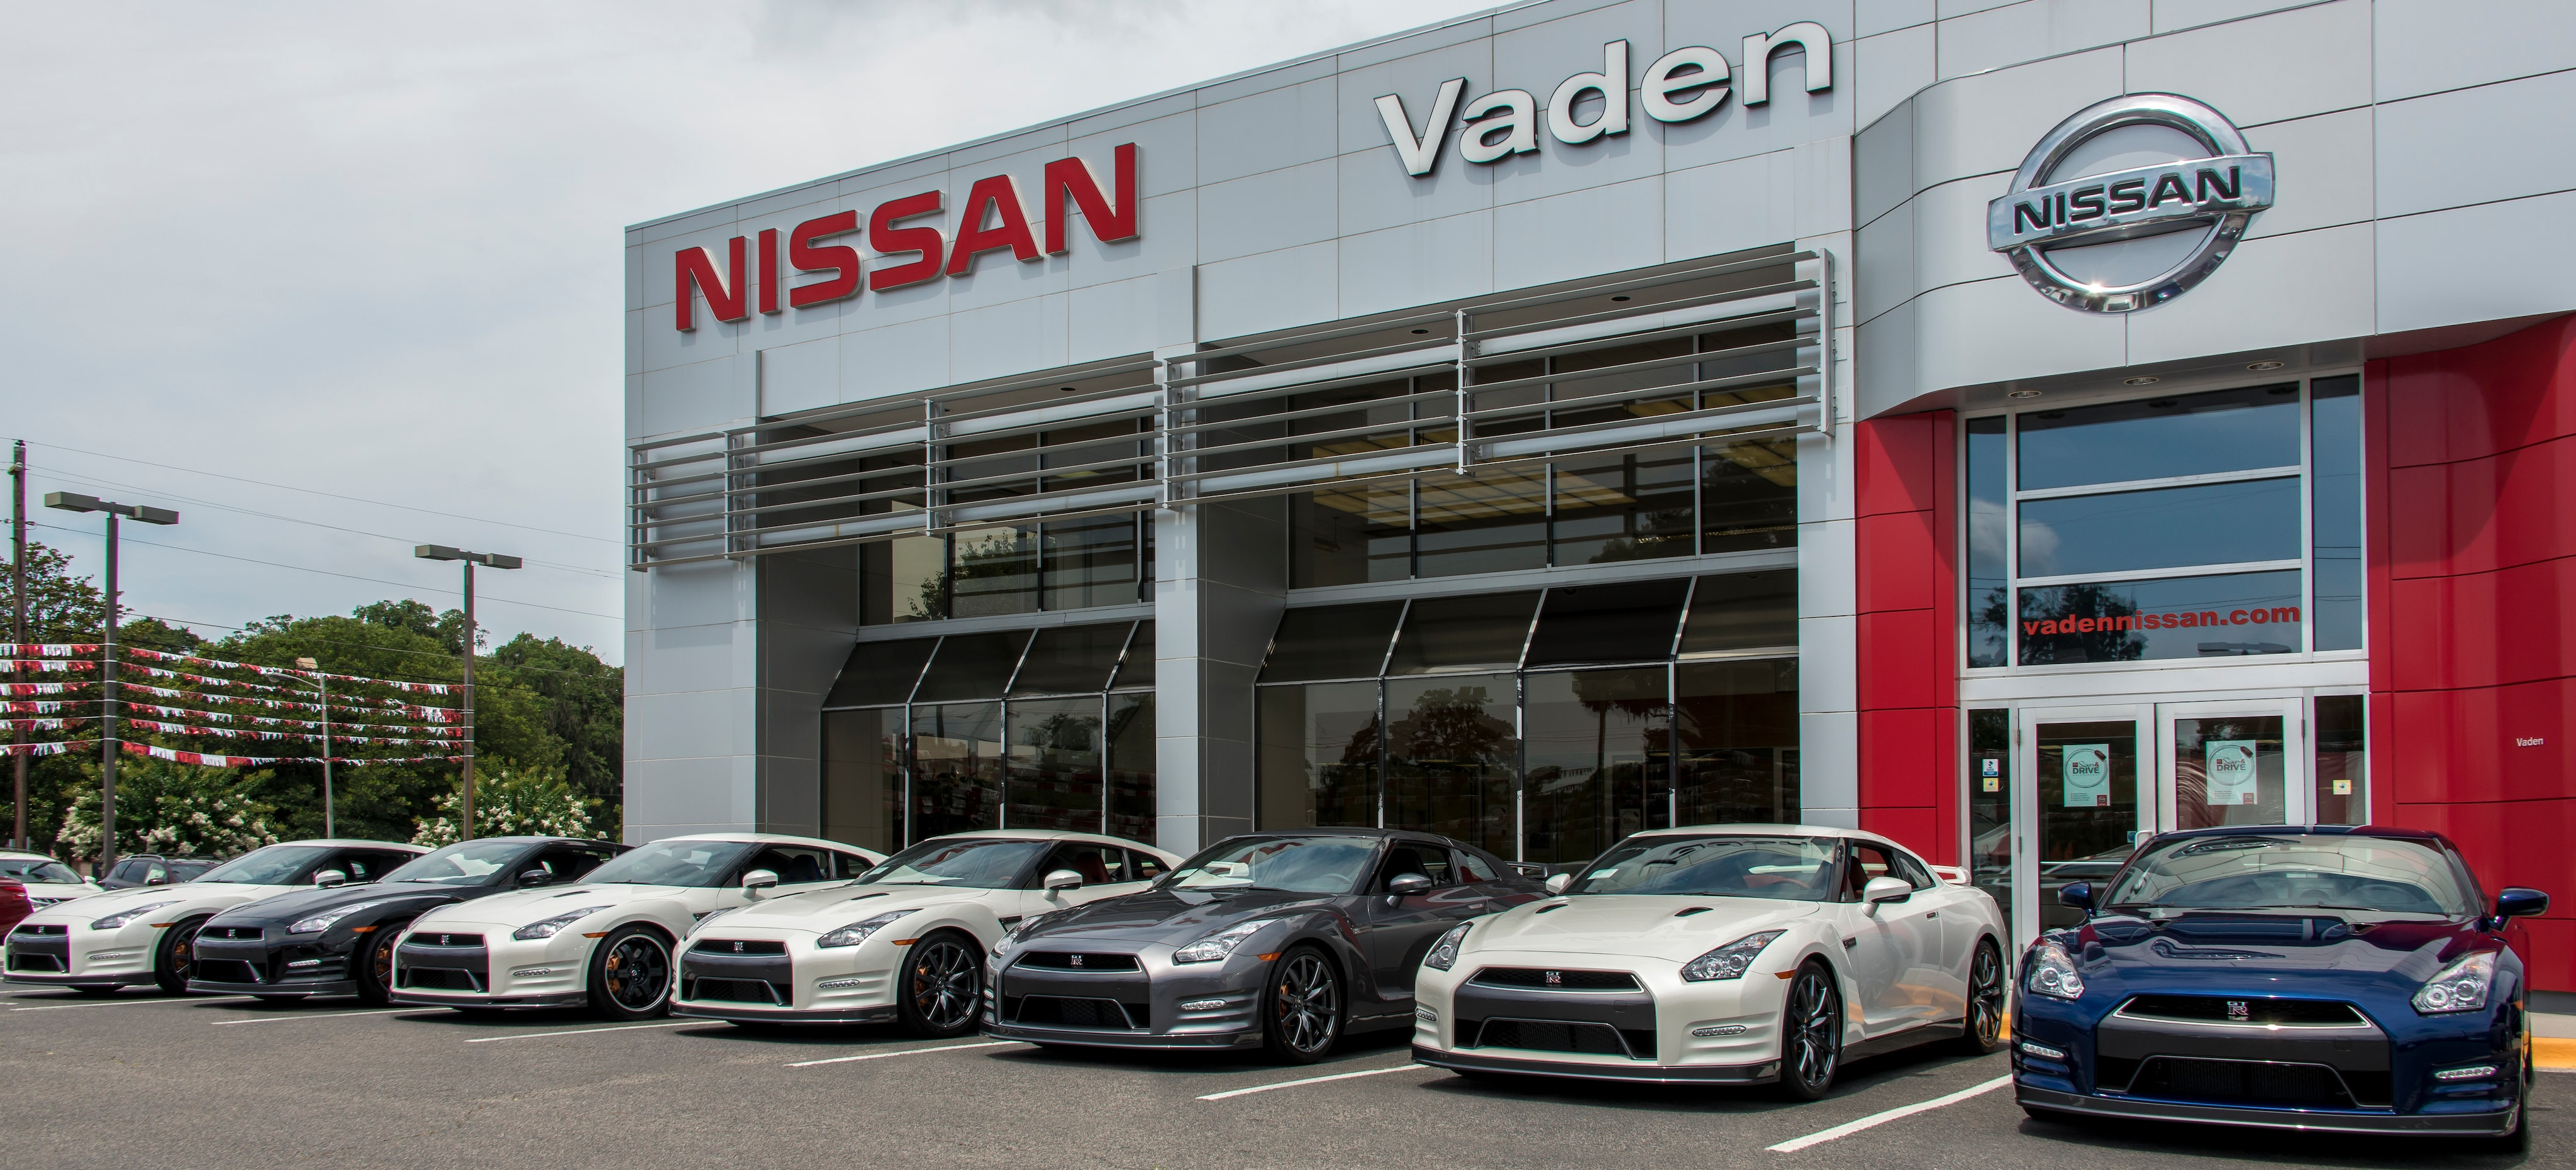 Car Dealerships In Savannah Ga >> About Vaden Nissan Of Savannah The Premiere Savannah Ga Nissan